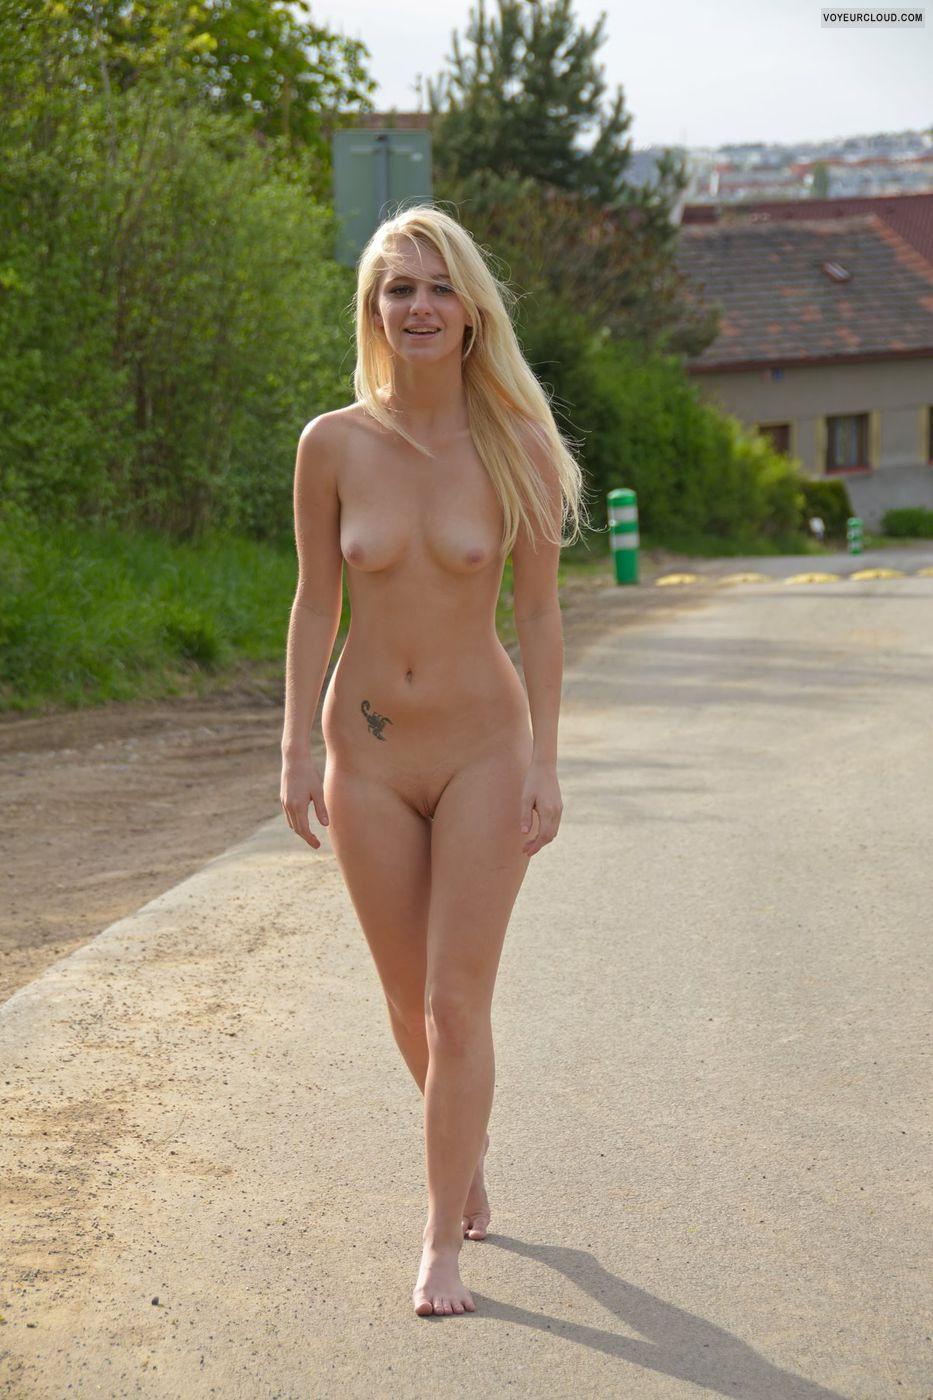 voyeurclouds com nude